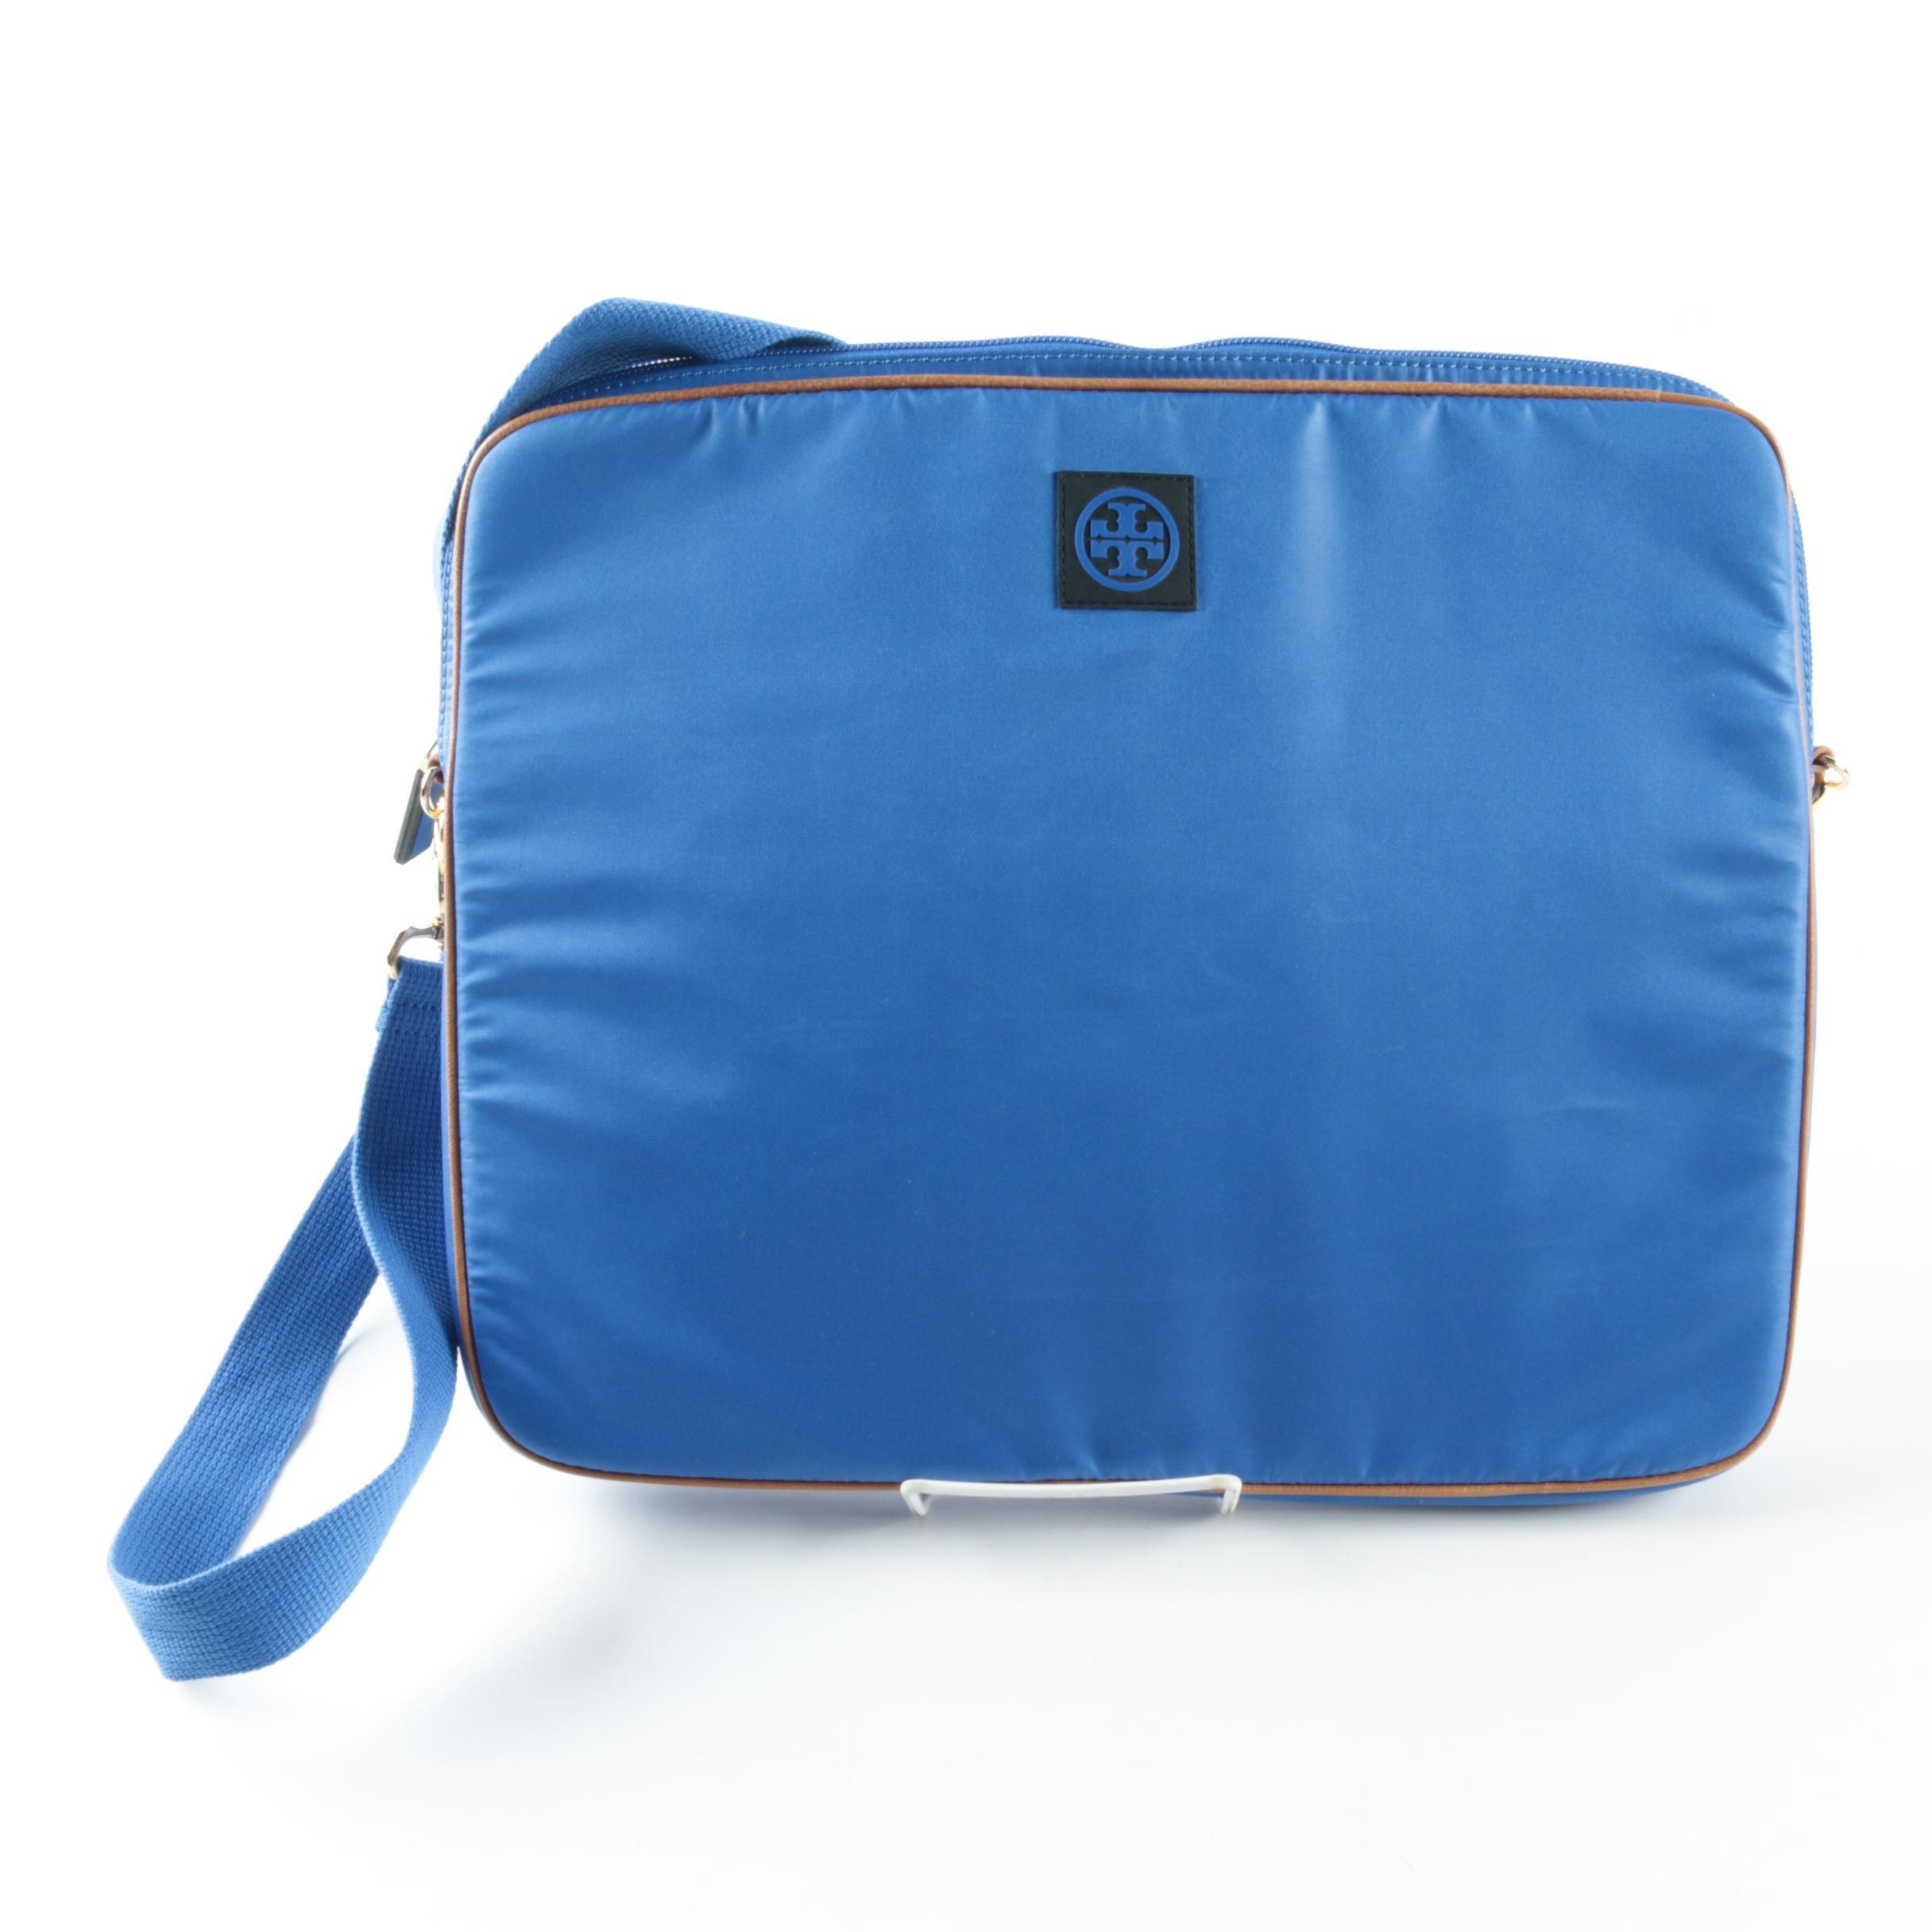 Tory Burch Blue Laptop Bag